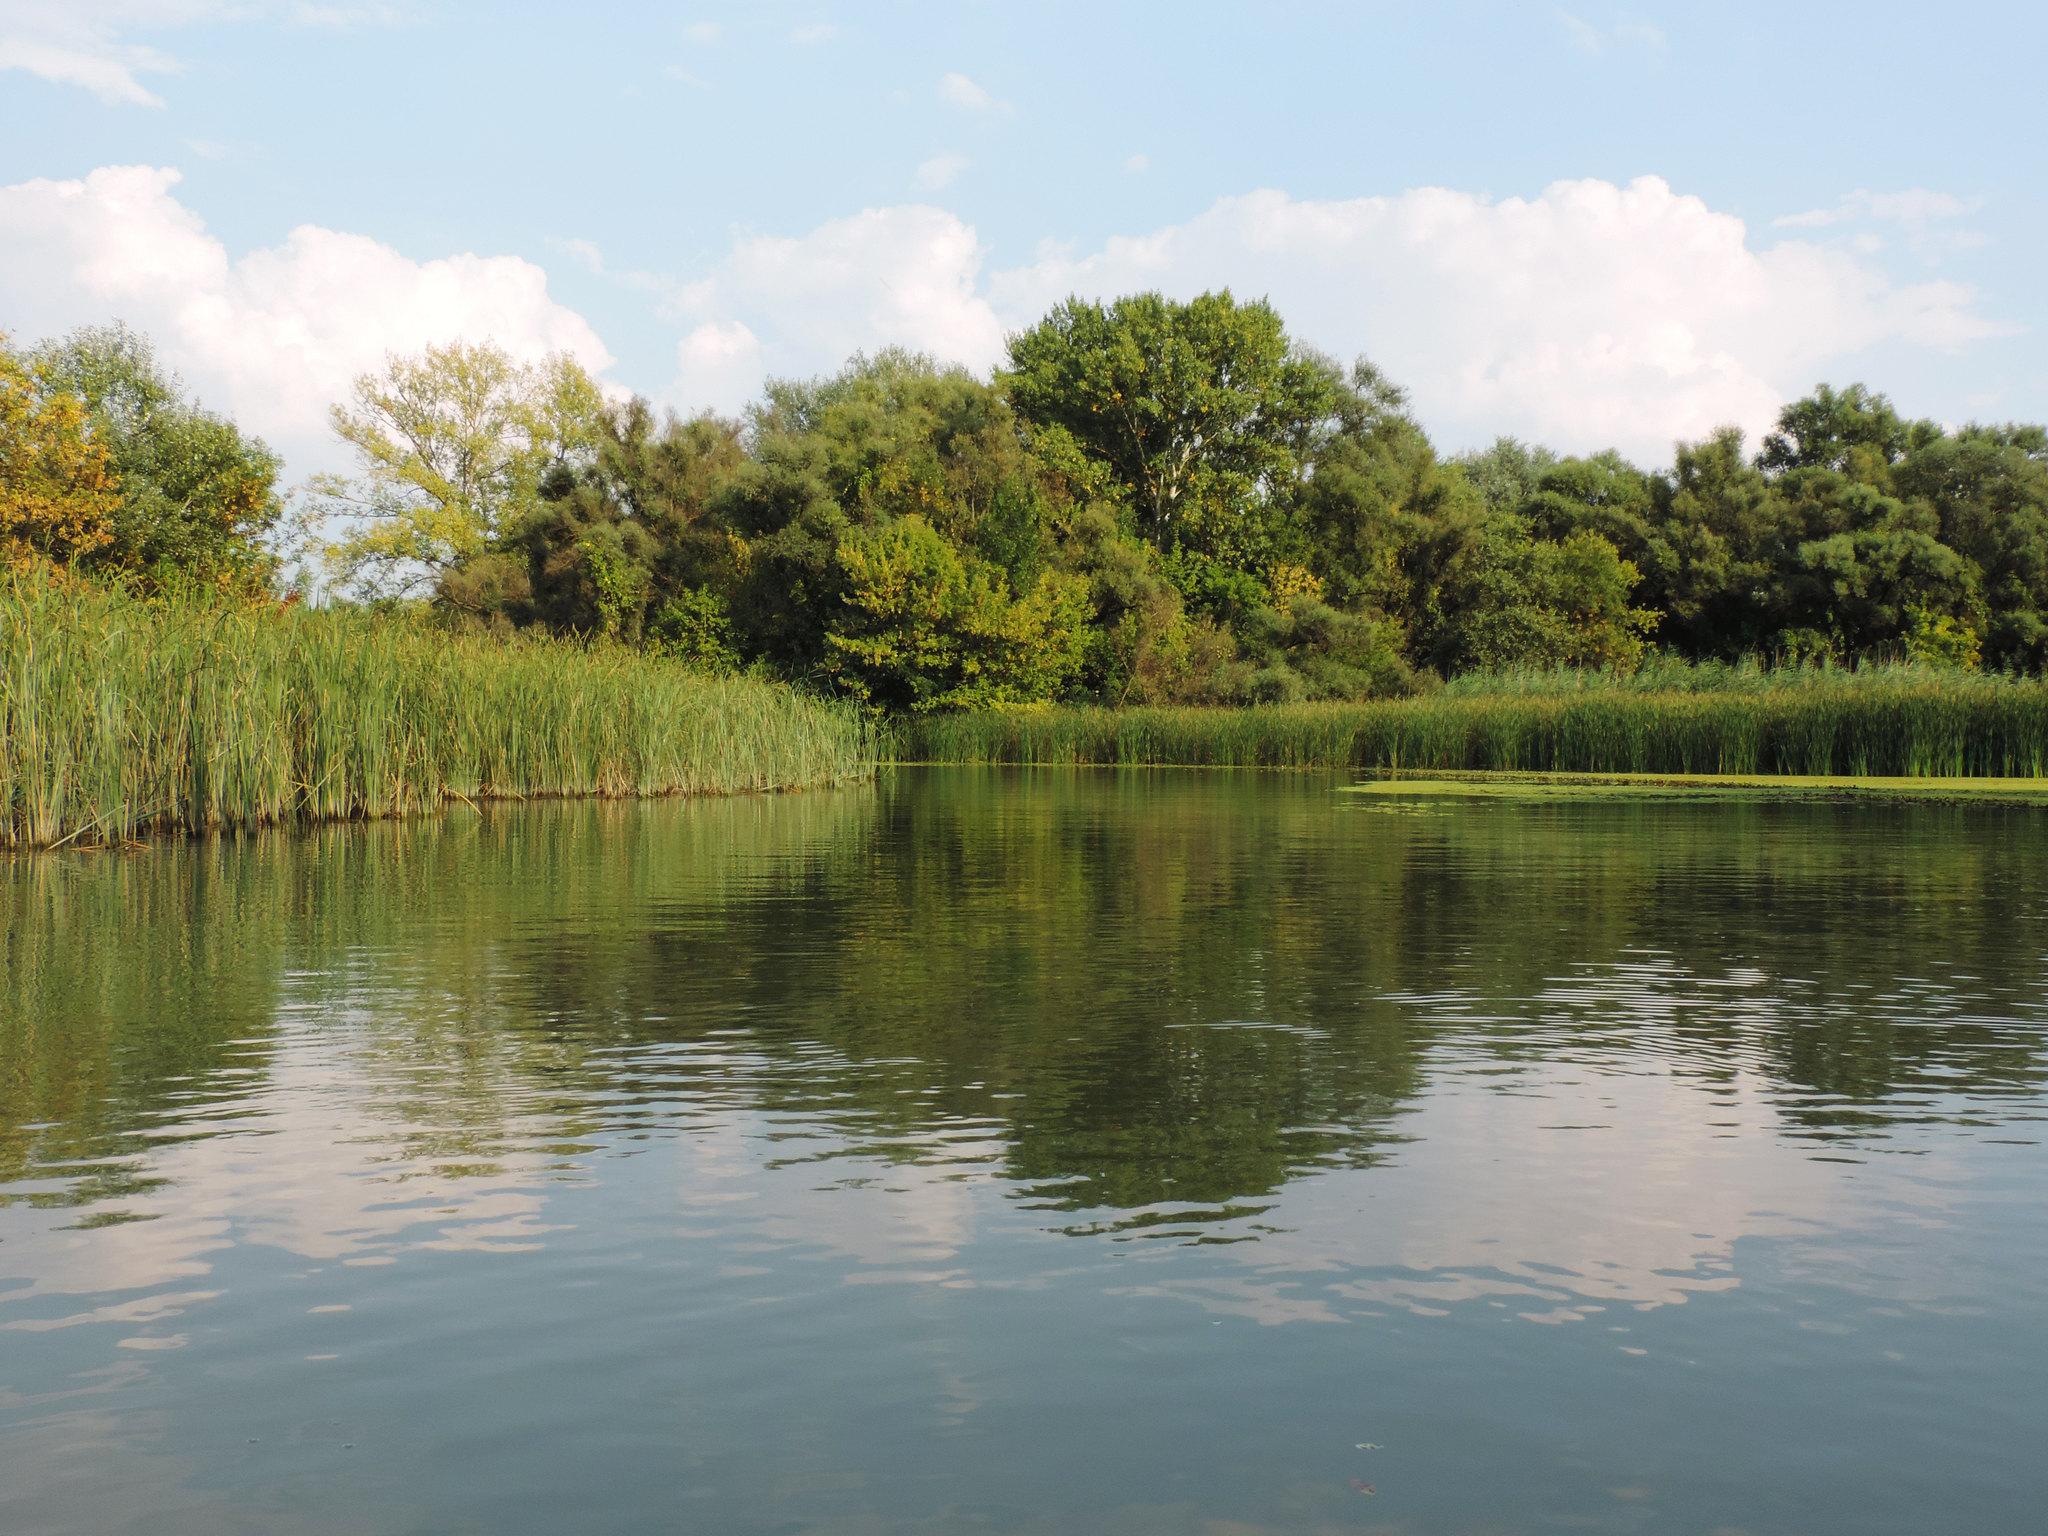 Lake Tisza, Hortobágy National Park, Hungary